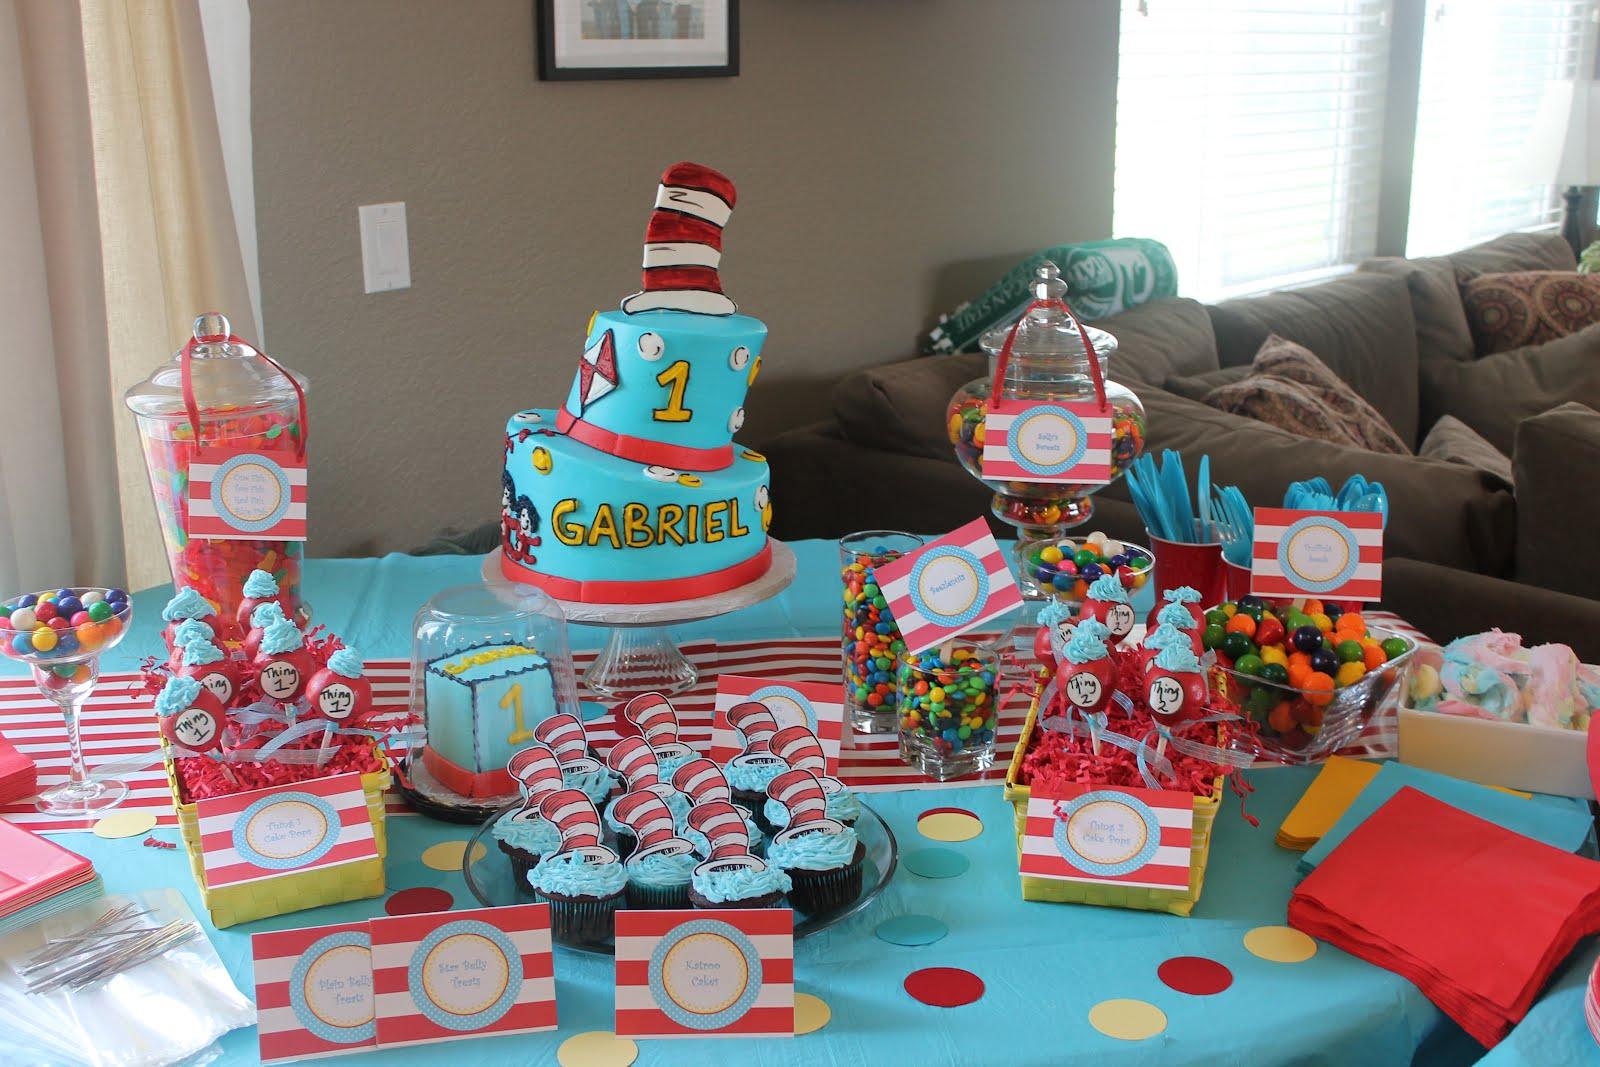 Life is Beautiful Gabriels 1st Birthday